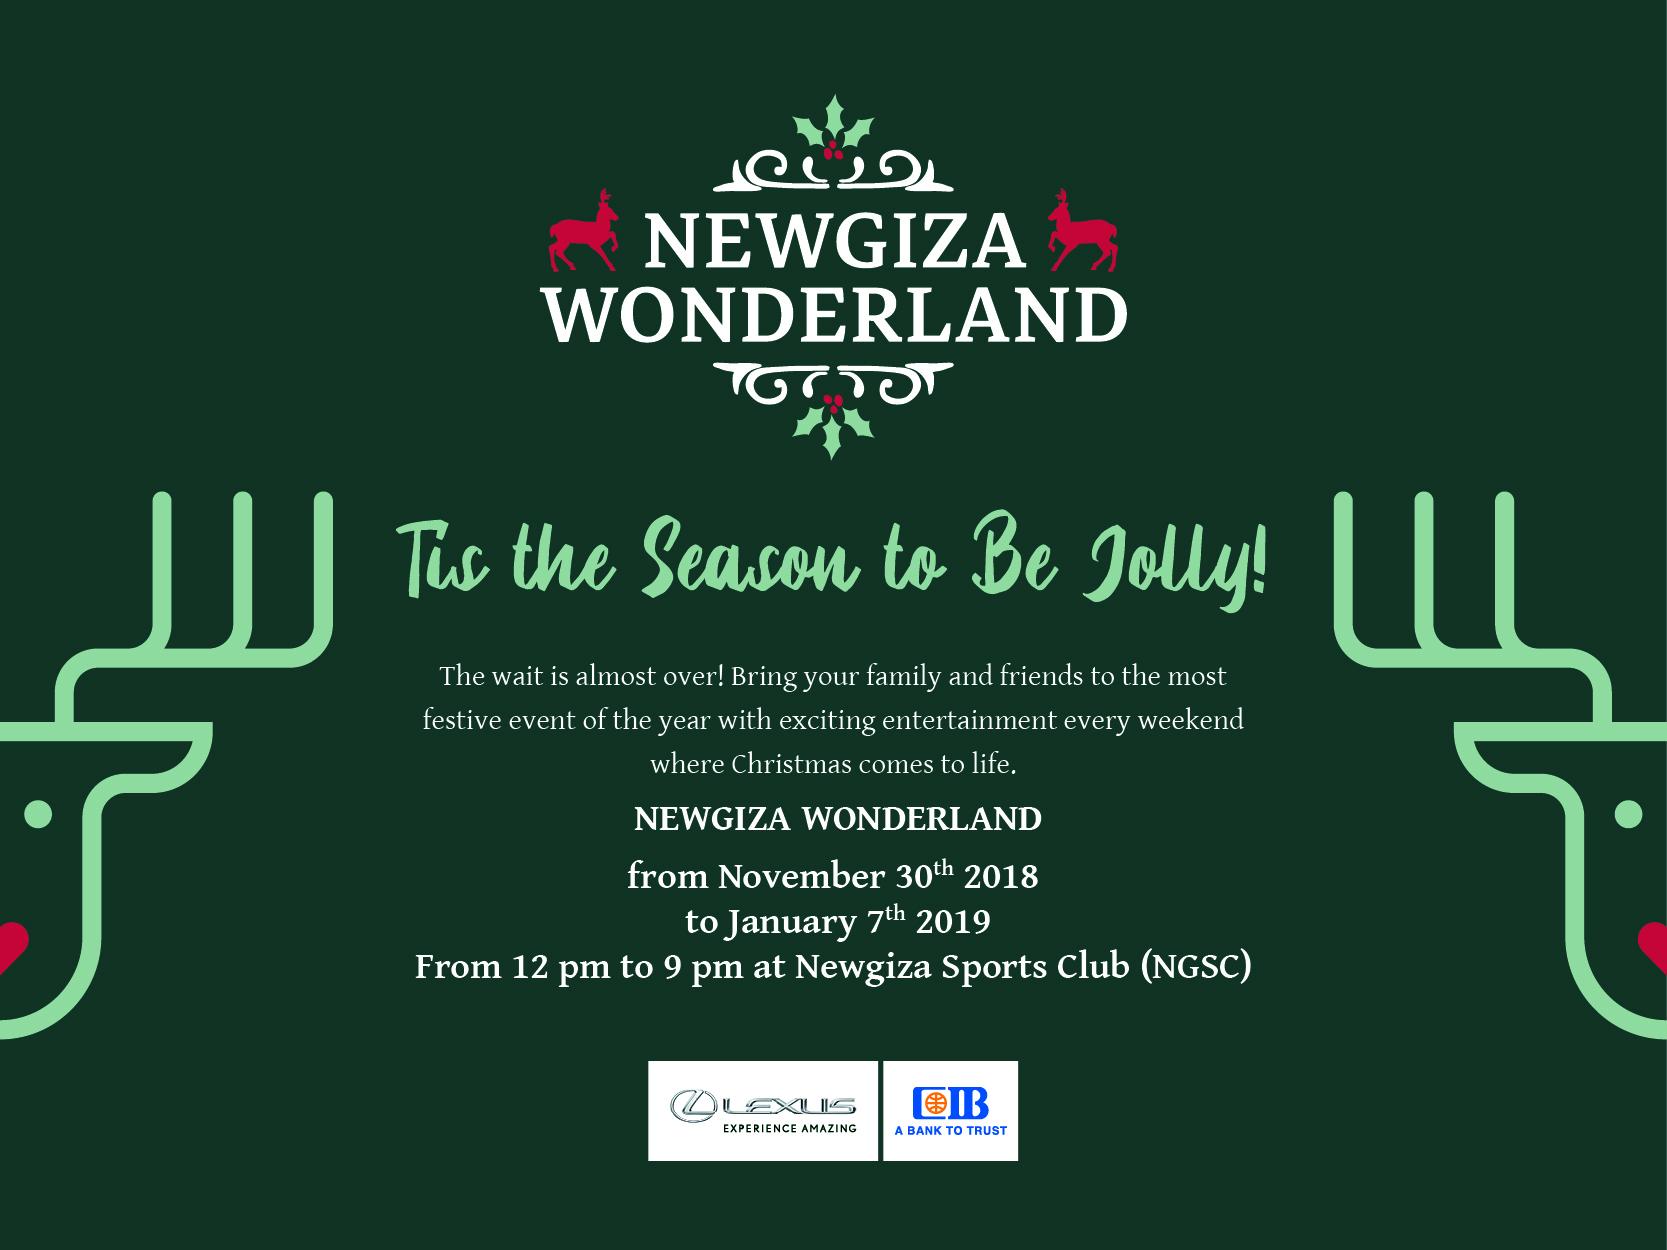 newgiza-wonderland-01.jpg